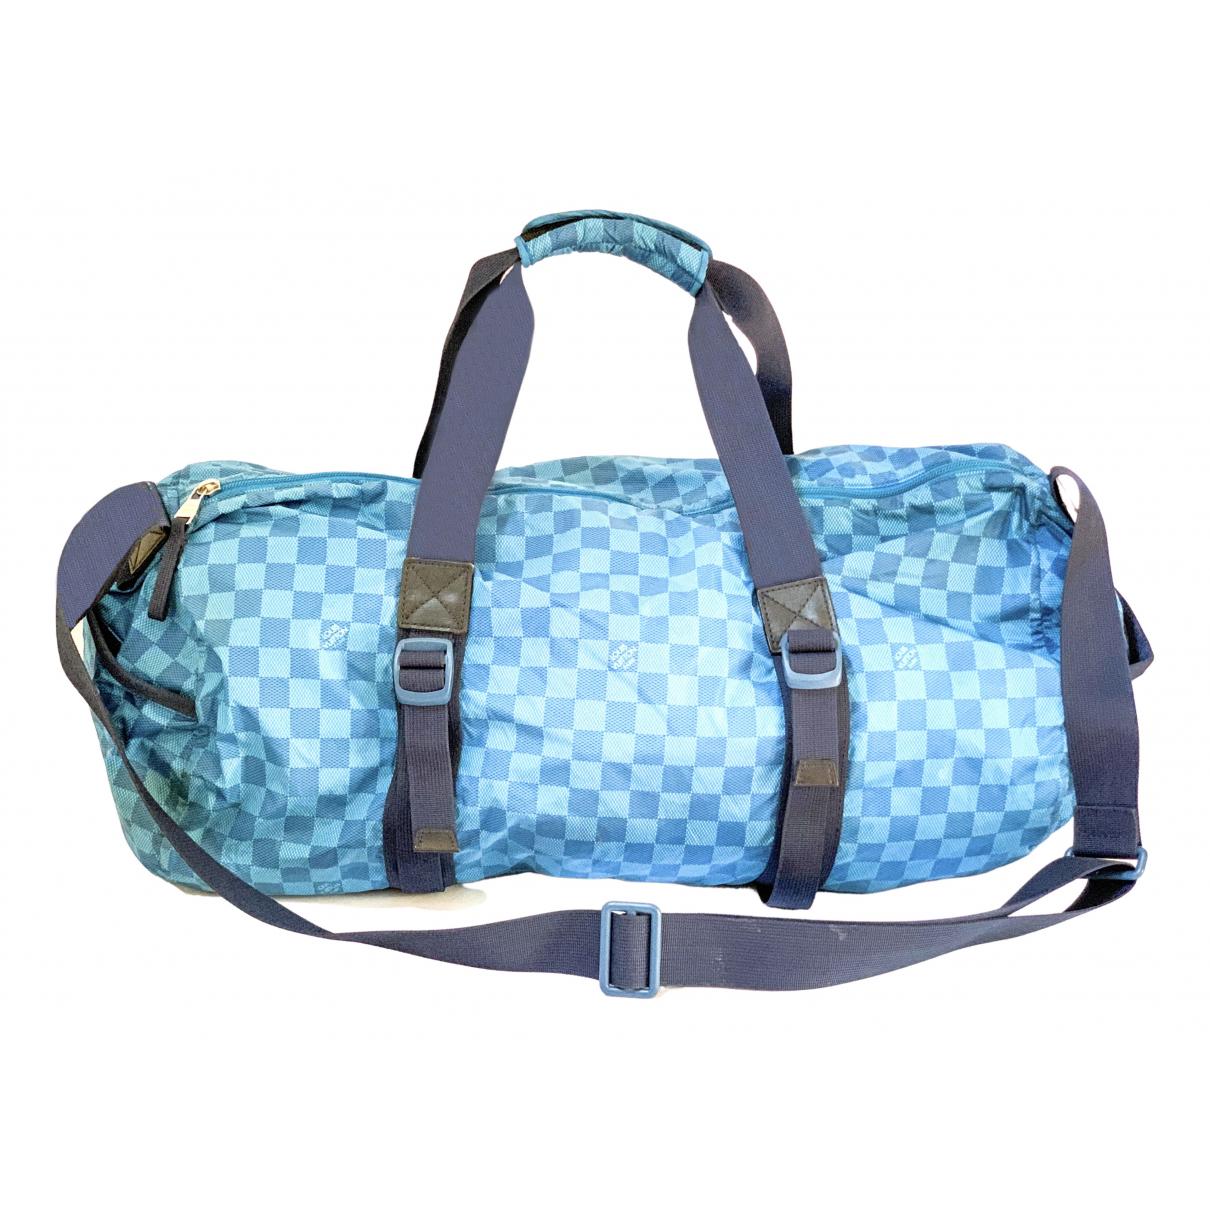 Louis Vuitton N bag for Men N